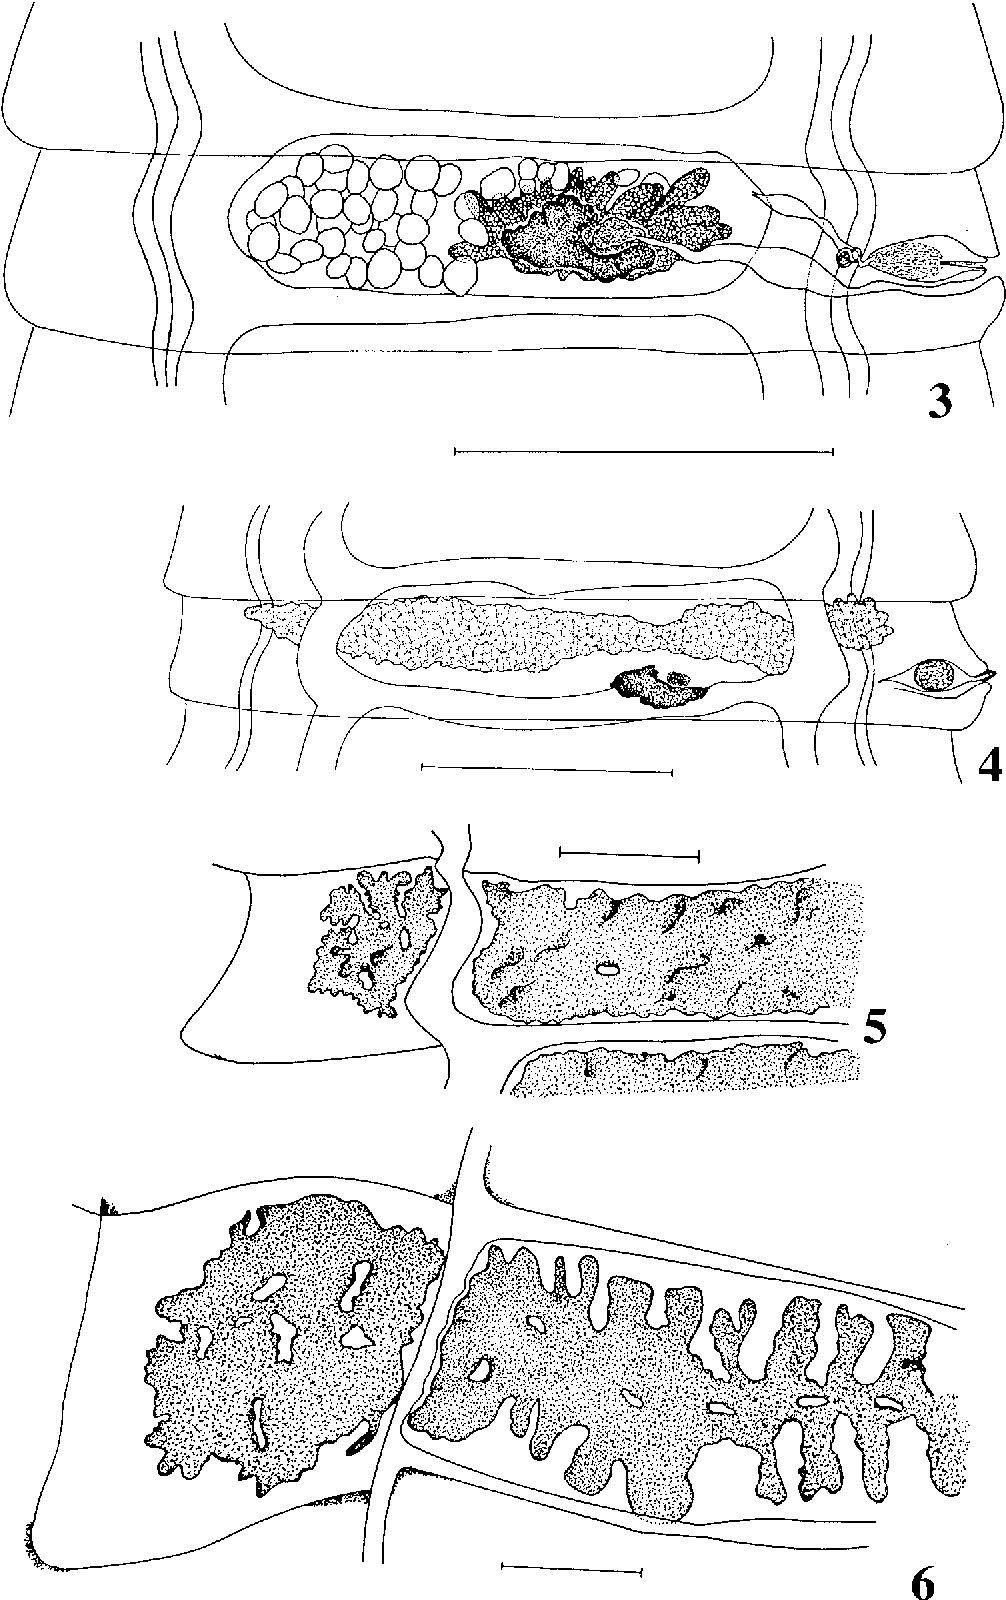 figure 3–6